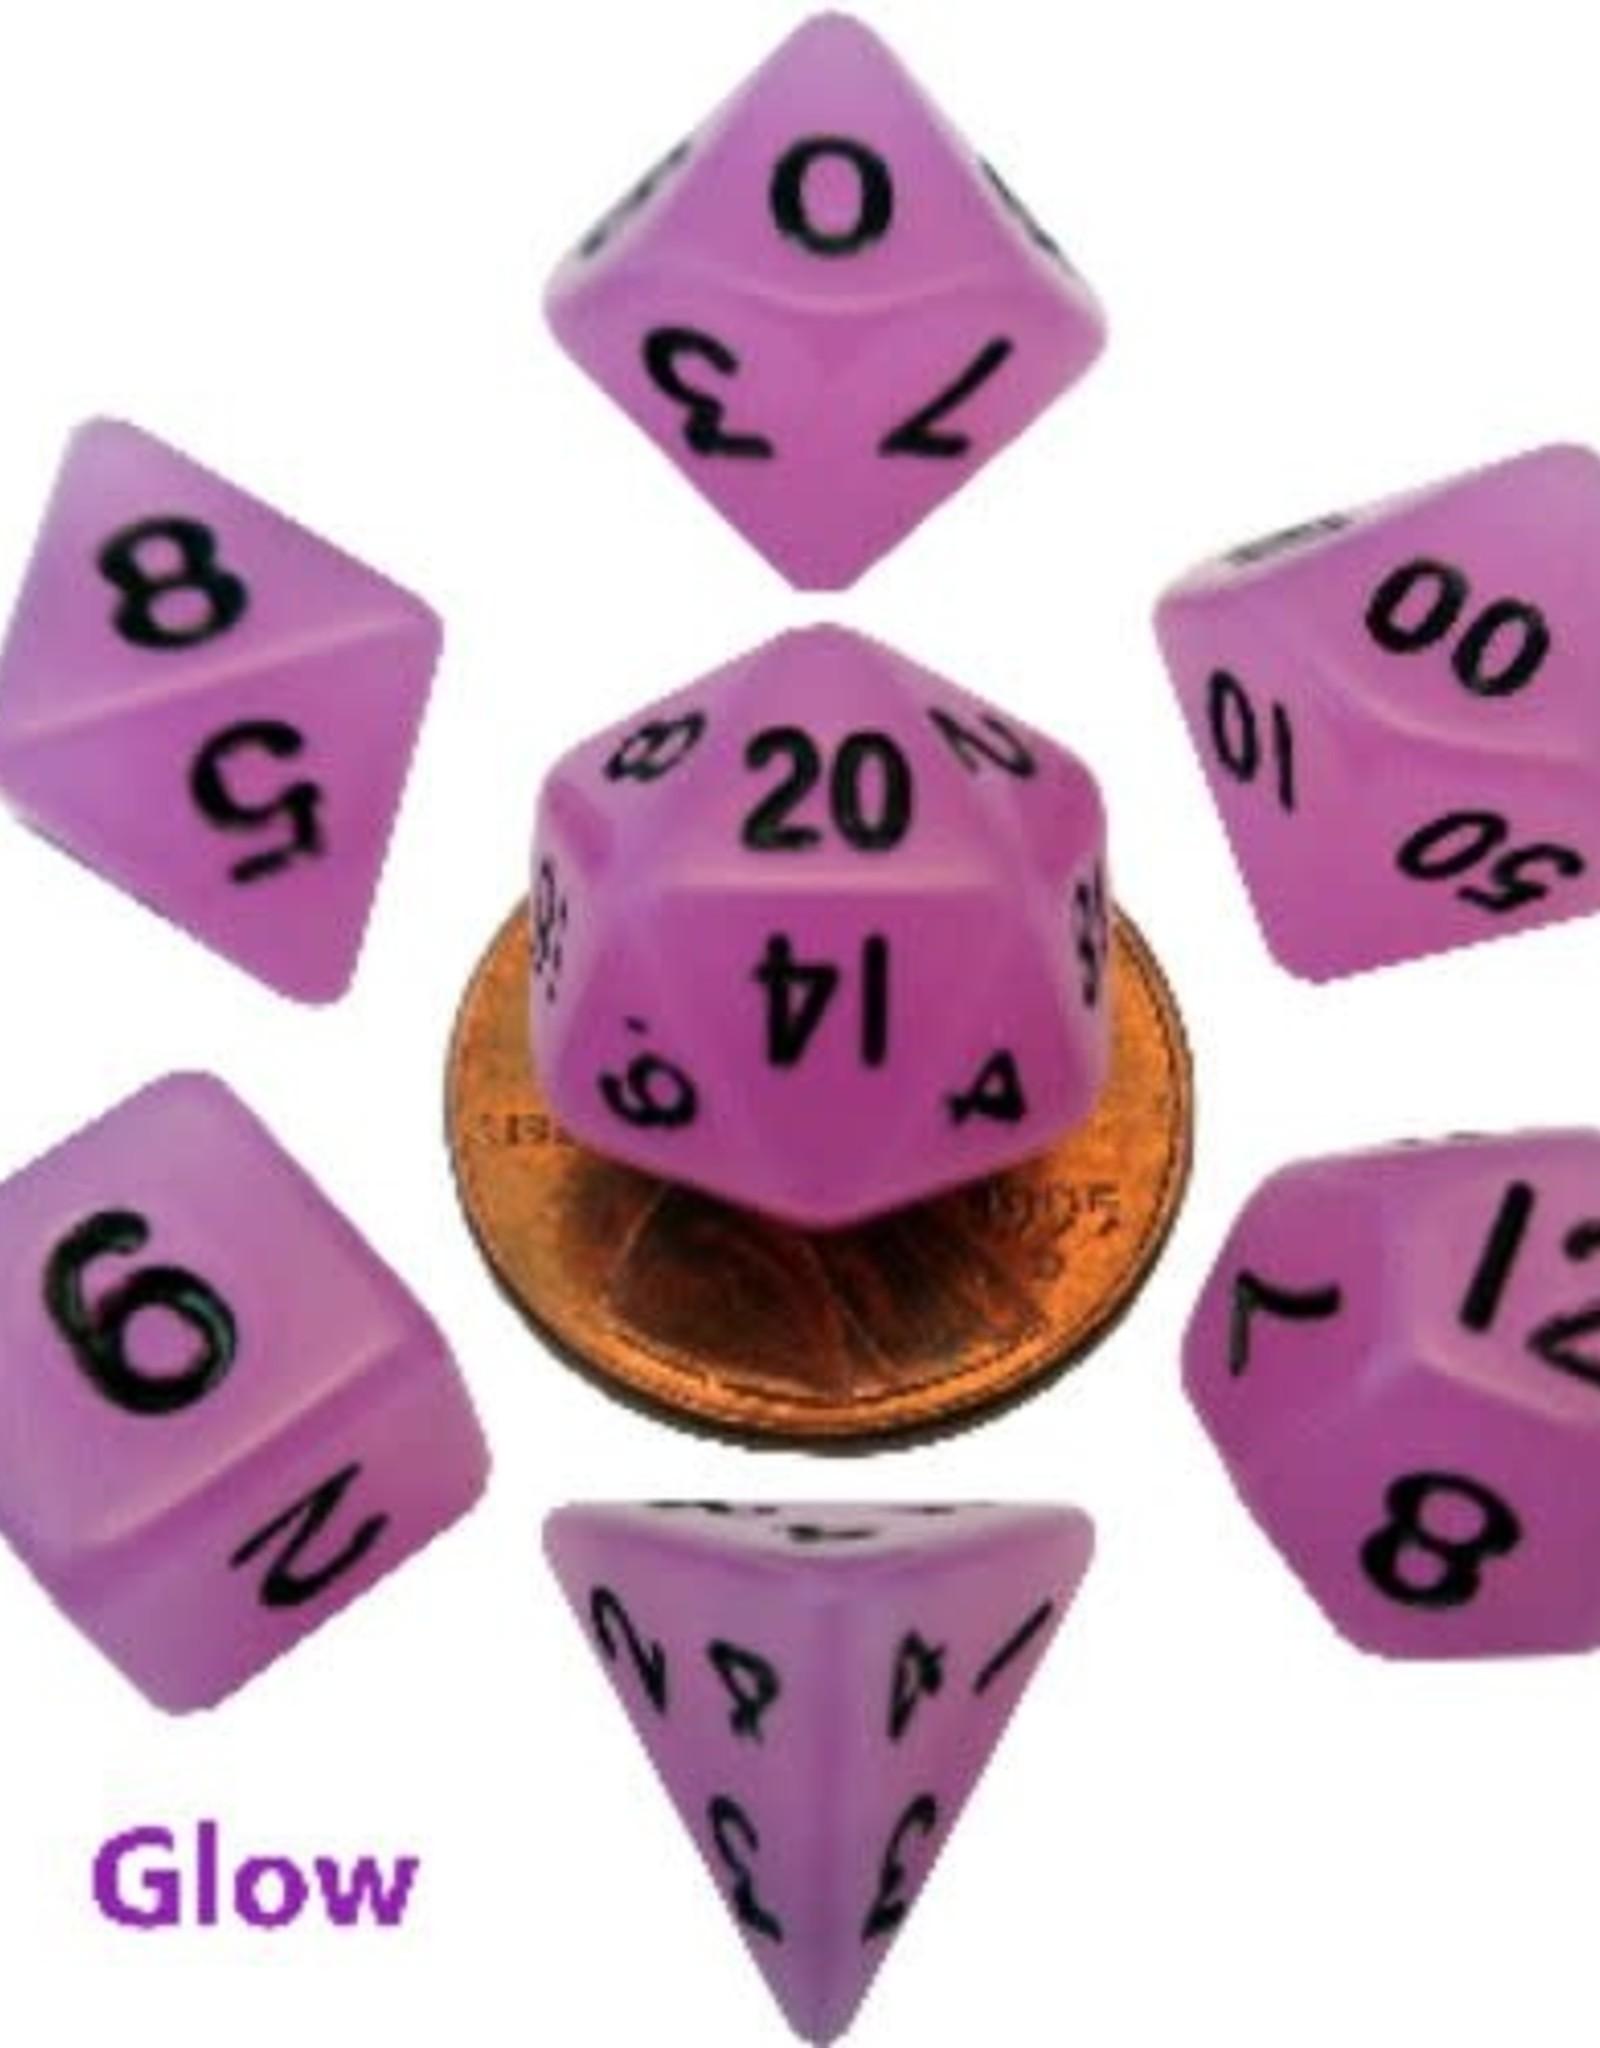 Metallic Dice Games 7ct Mini Poly Dice Set Glow Purple w/Black